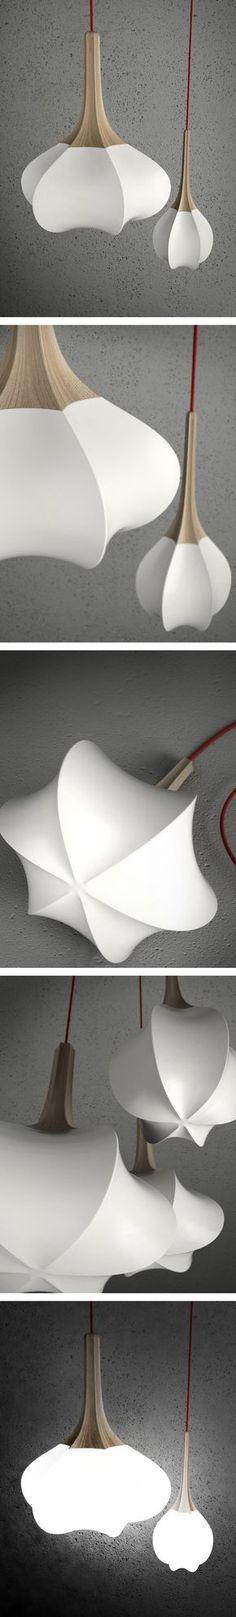 Swell Lamp